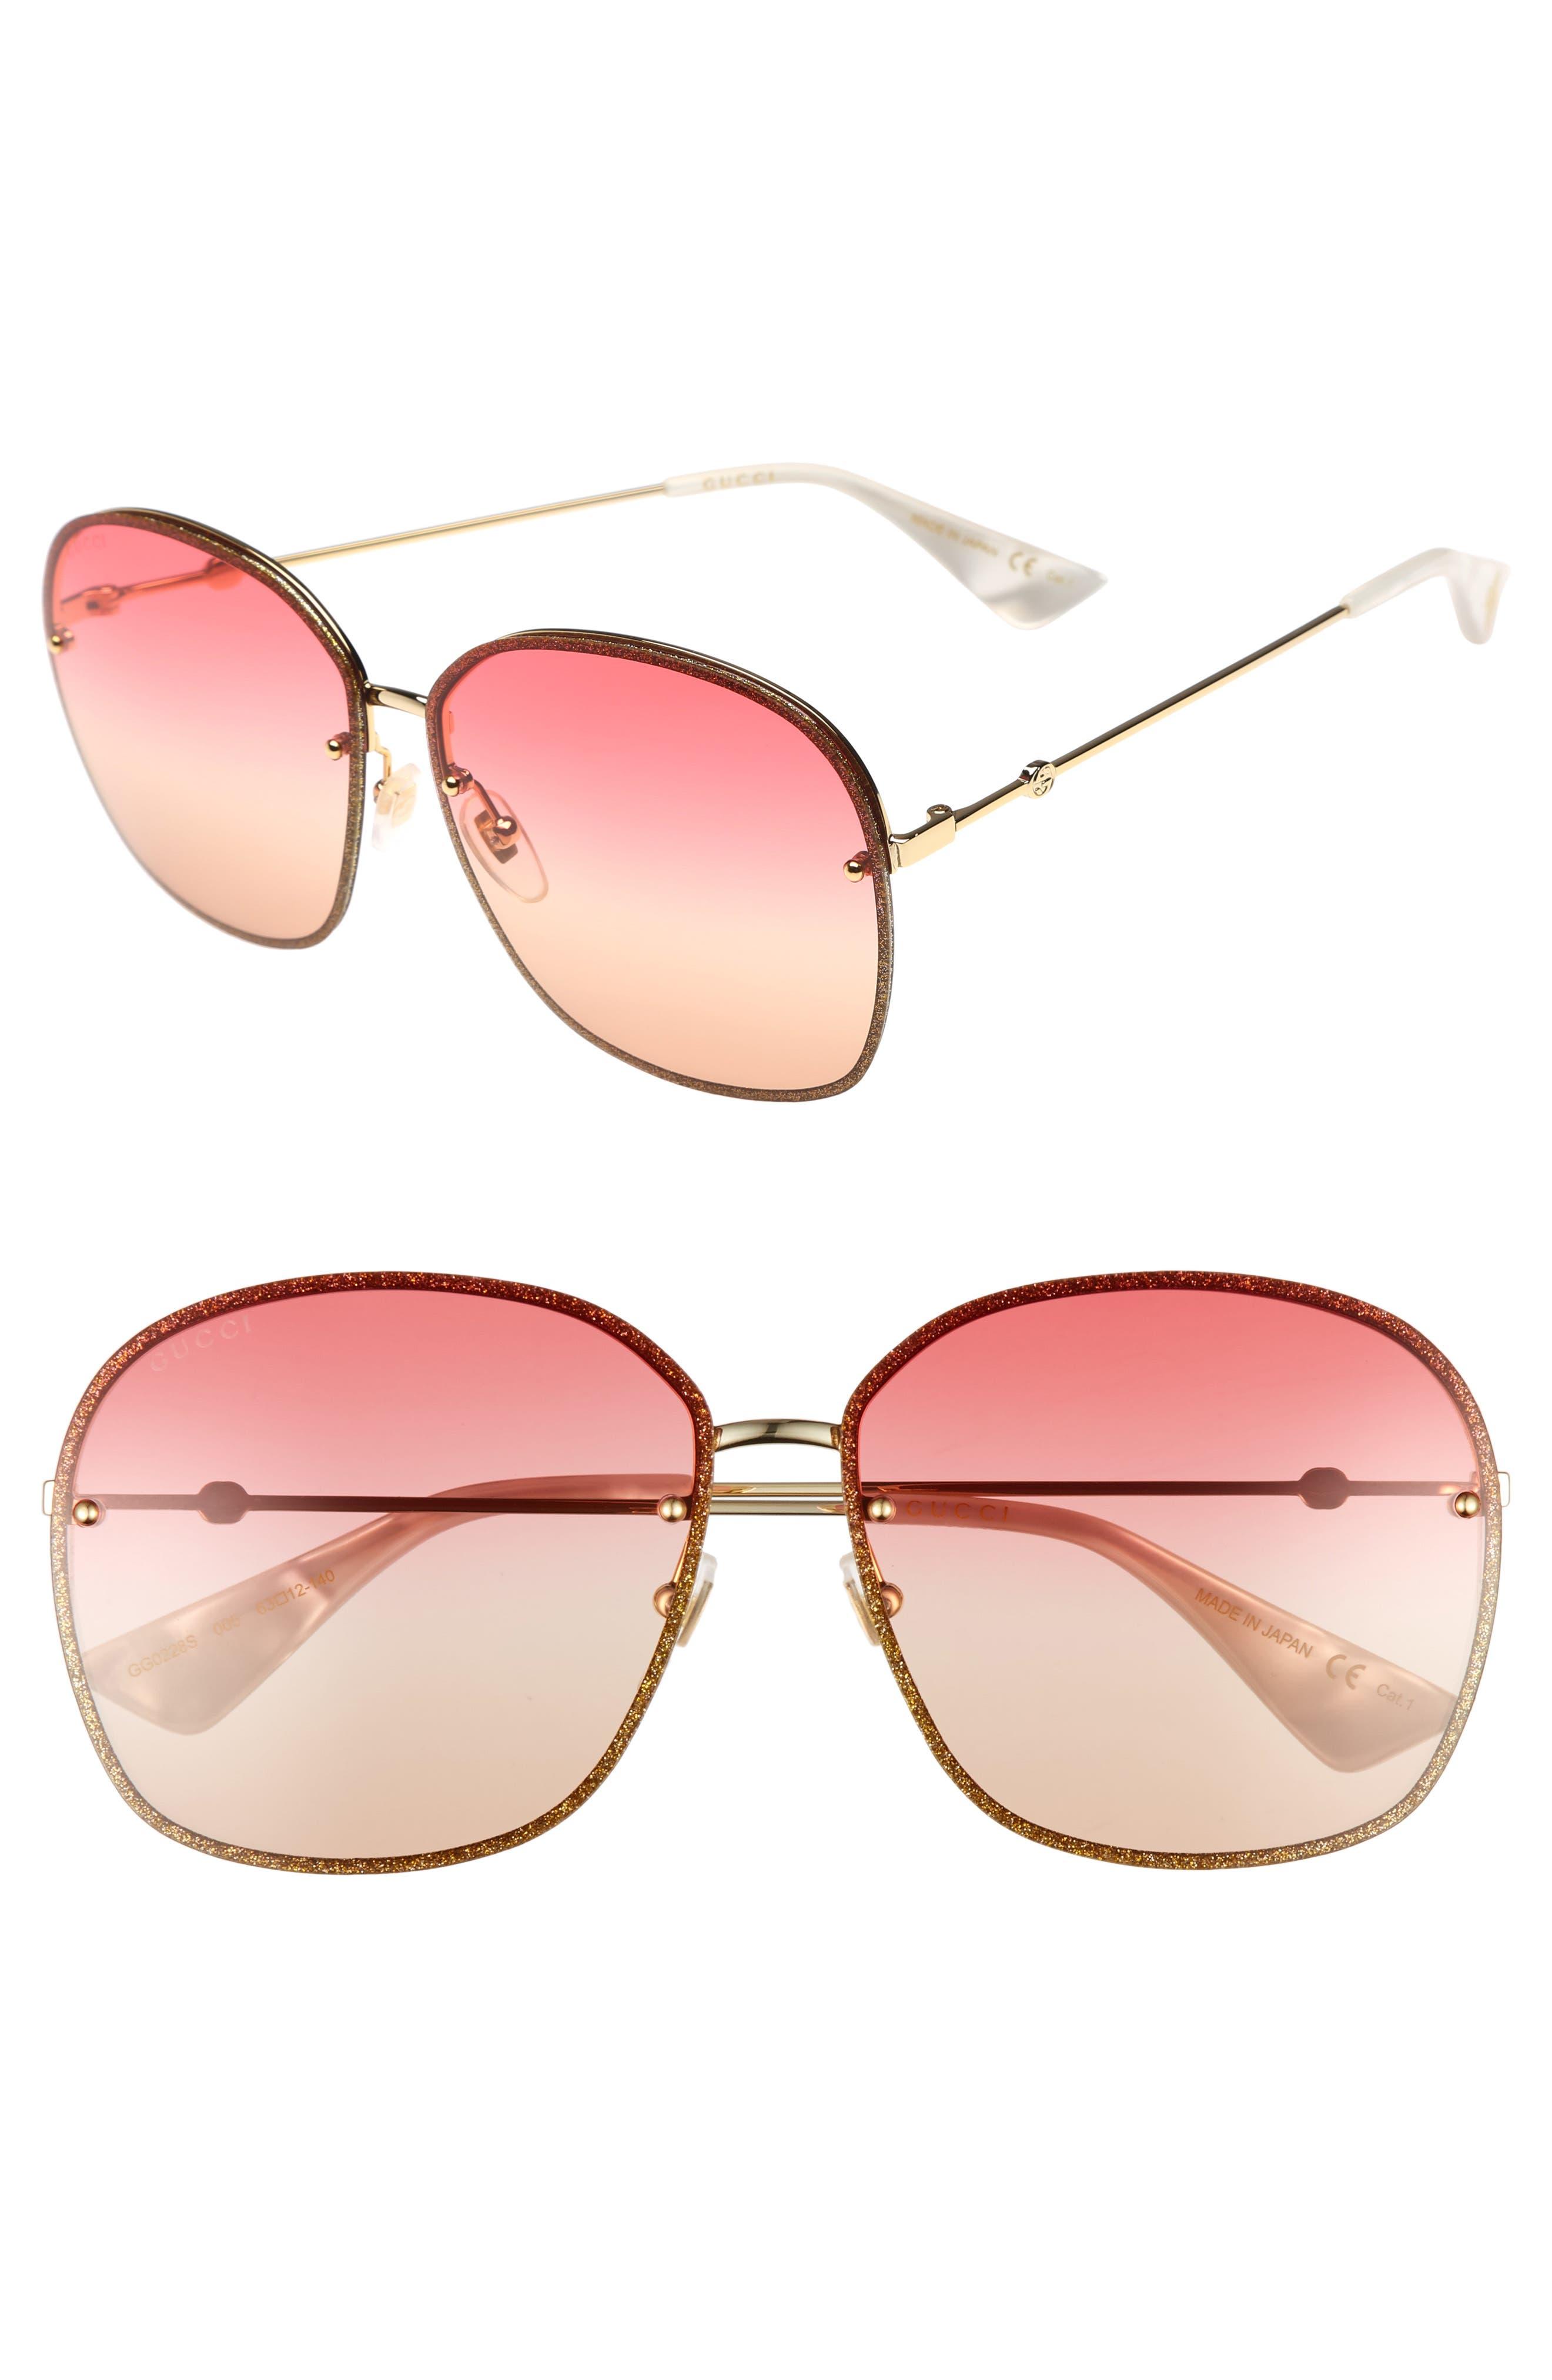 Main Image - Gucci 63mm Oversize Square Sunglasses